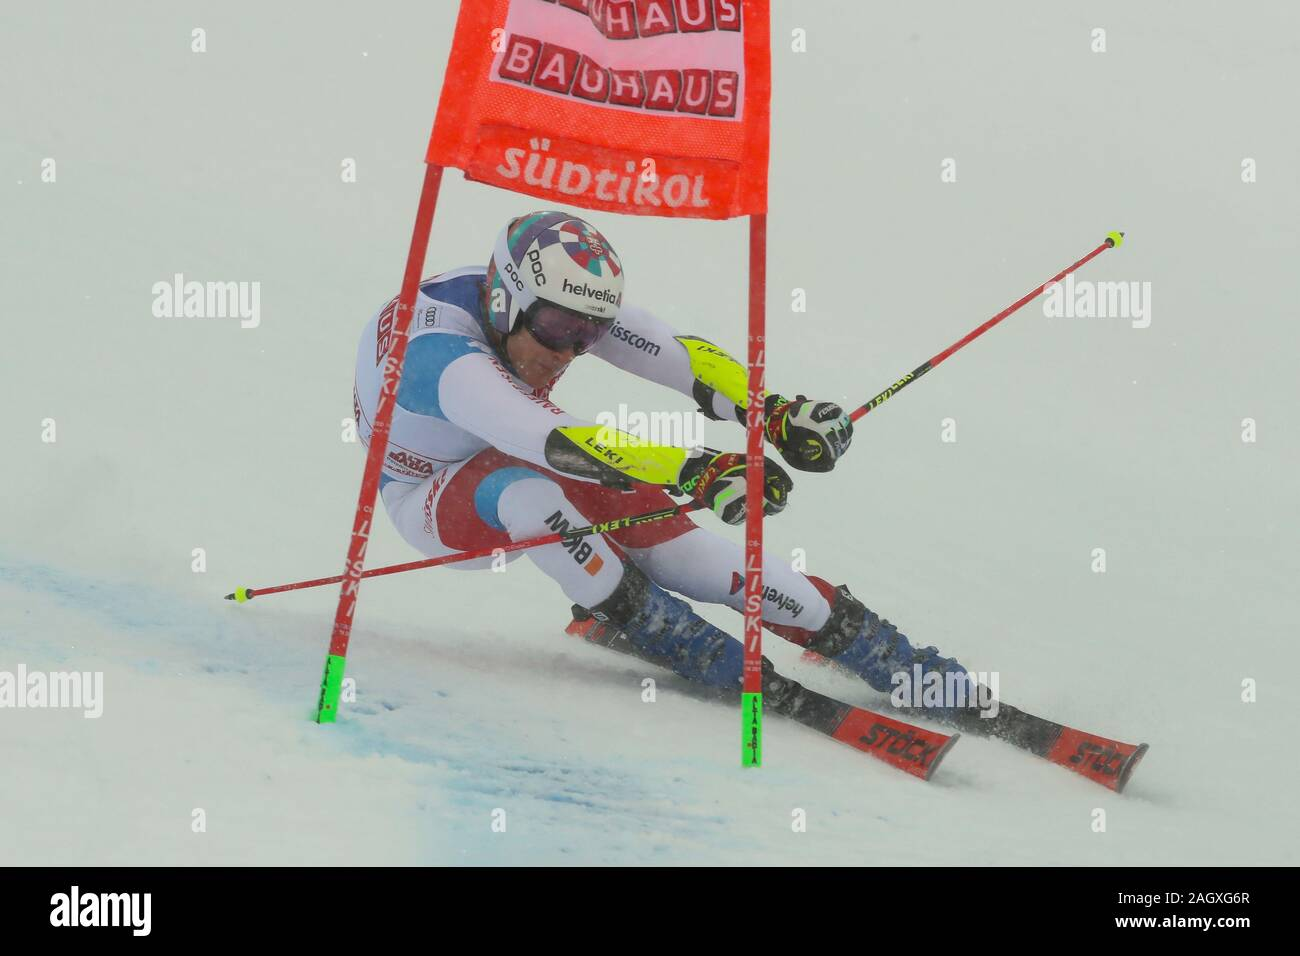 Alta Badia, Italy. 22nd Dec, 2019. Giant Slalom Men, Ski in Alta Badia, Italy, December 22 2019 Credit: Independent Photo Agency/Alamy Live News Stock Photo